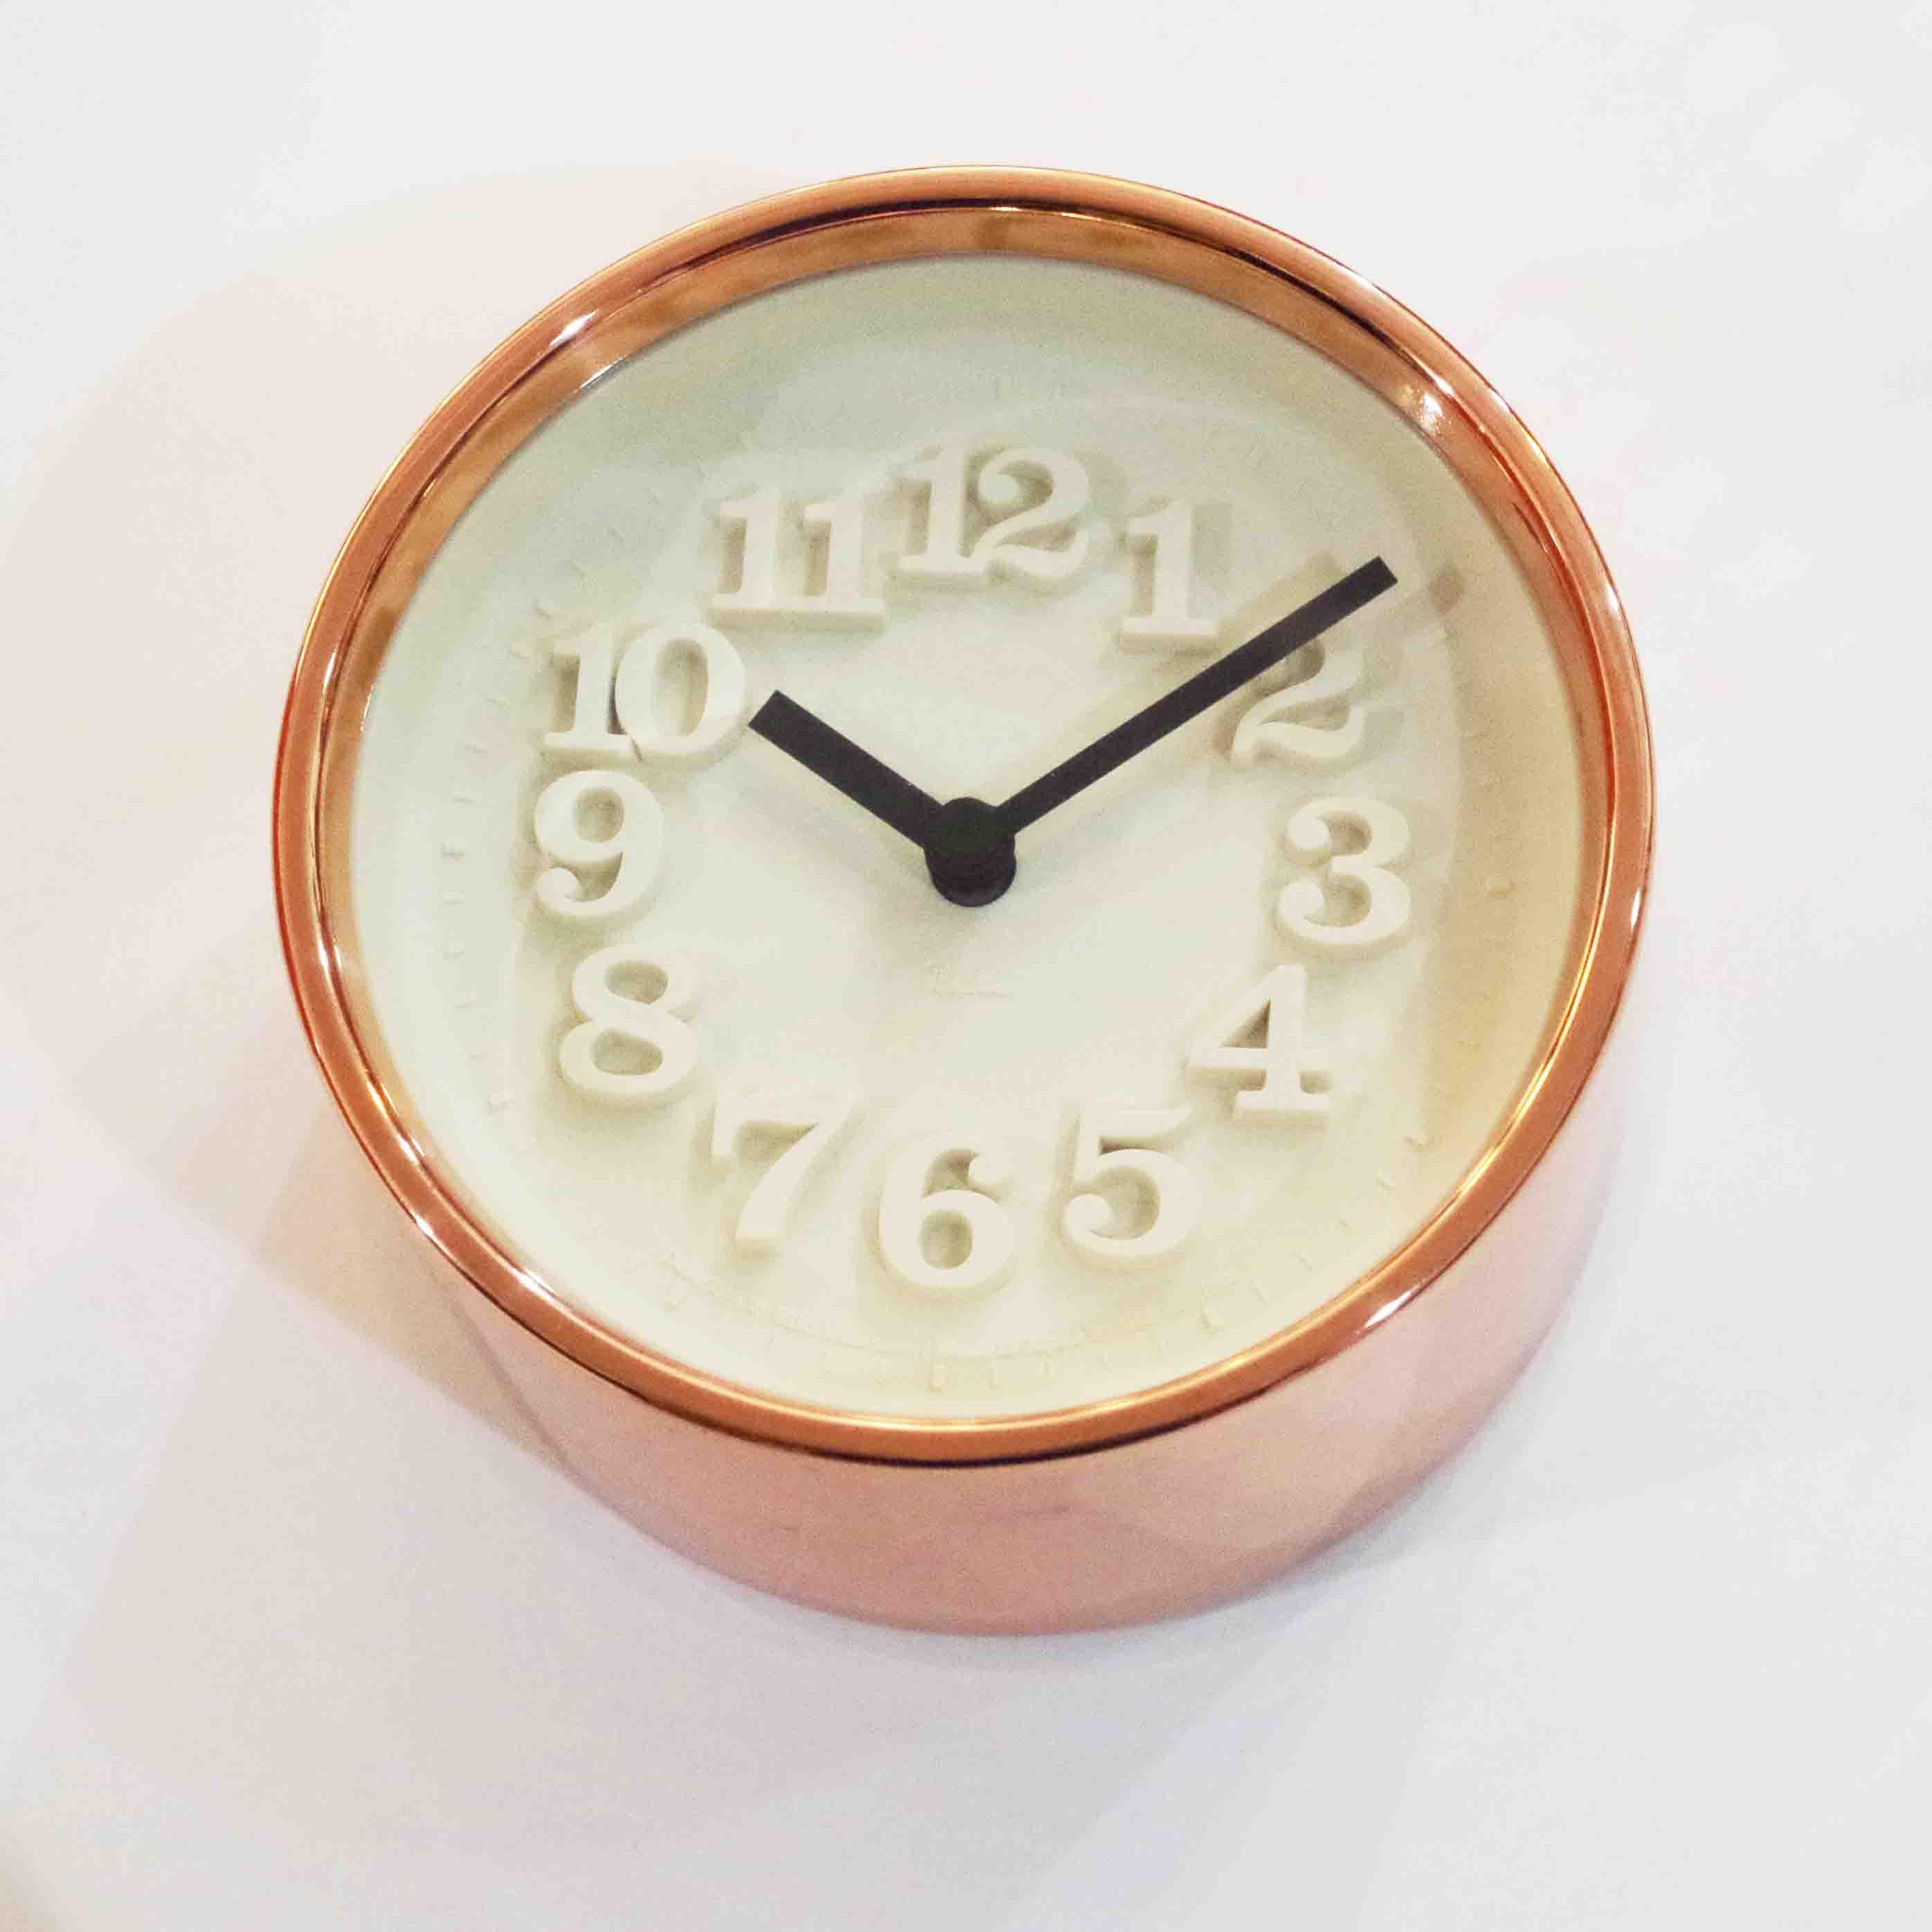 Lemnos レムノス 小さな時計 純銅仕様【わけあり】